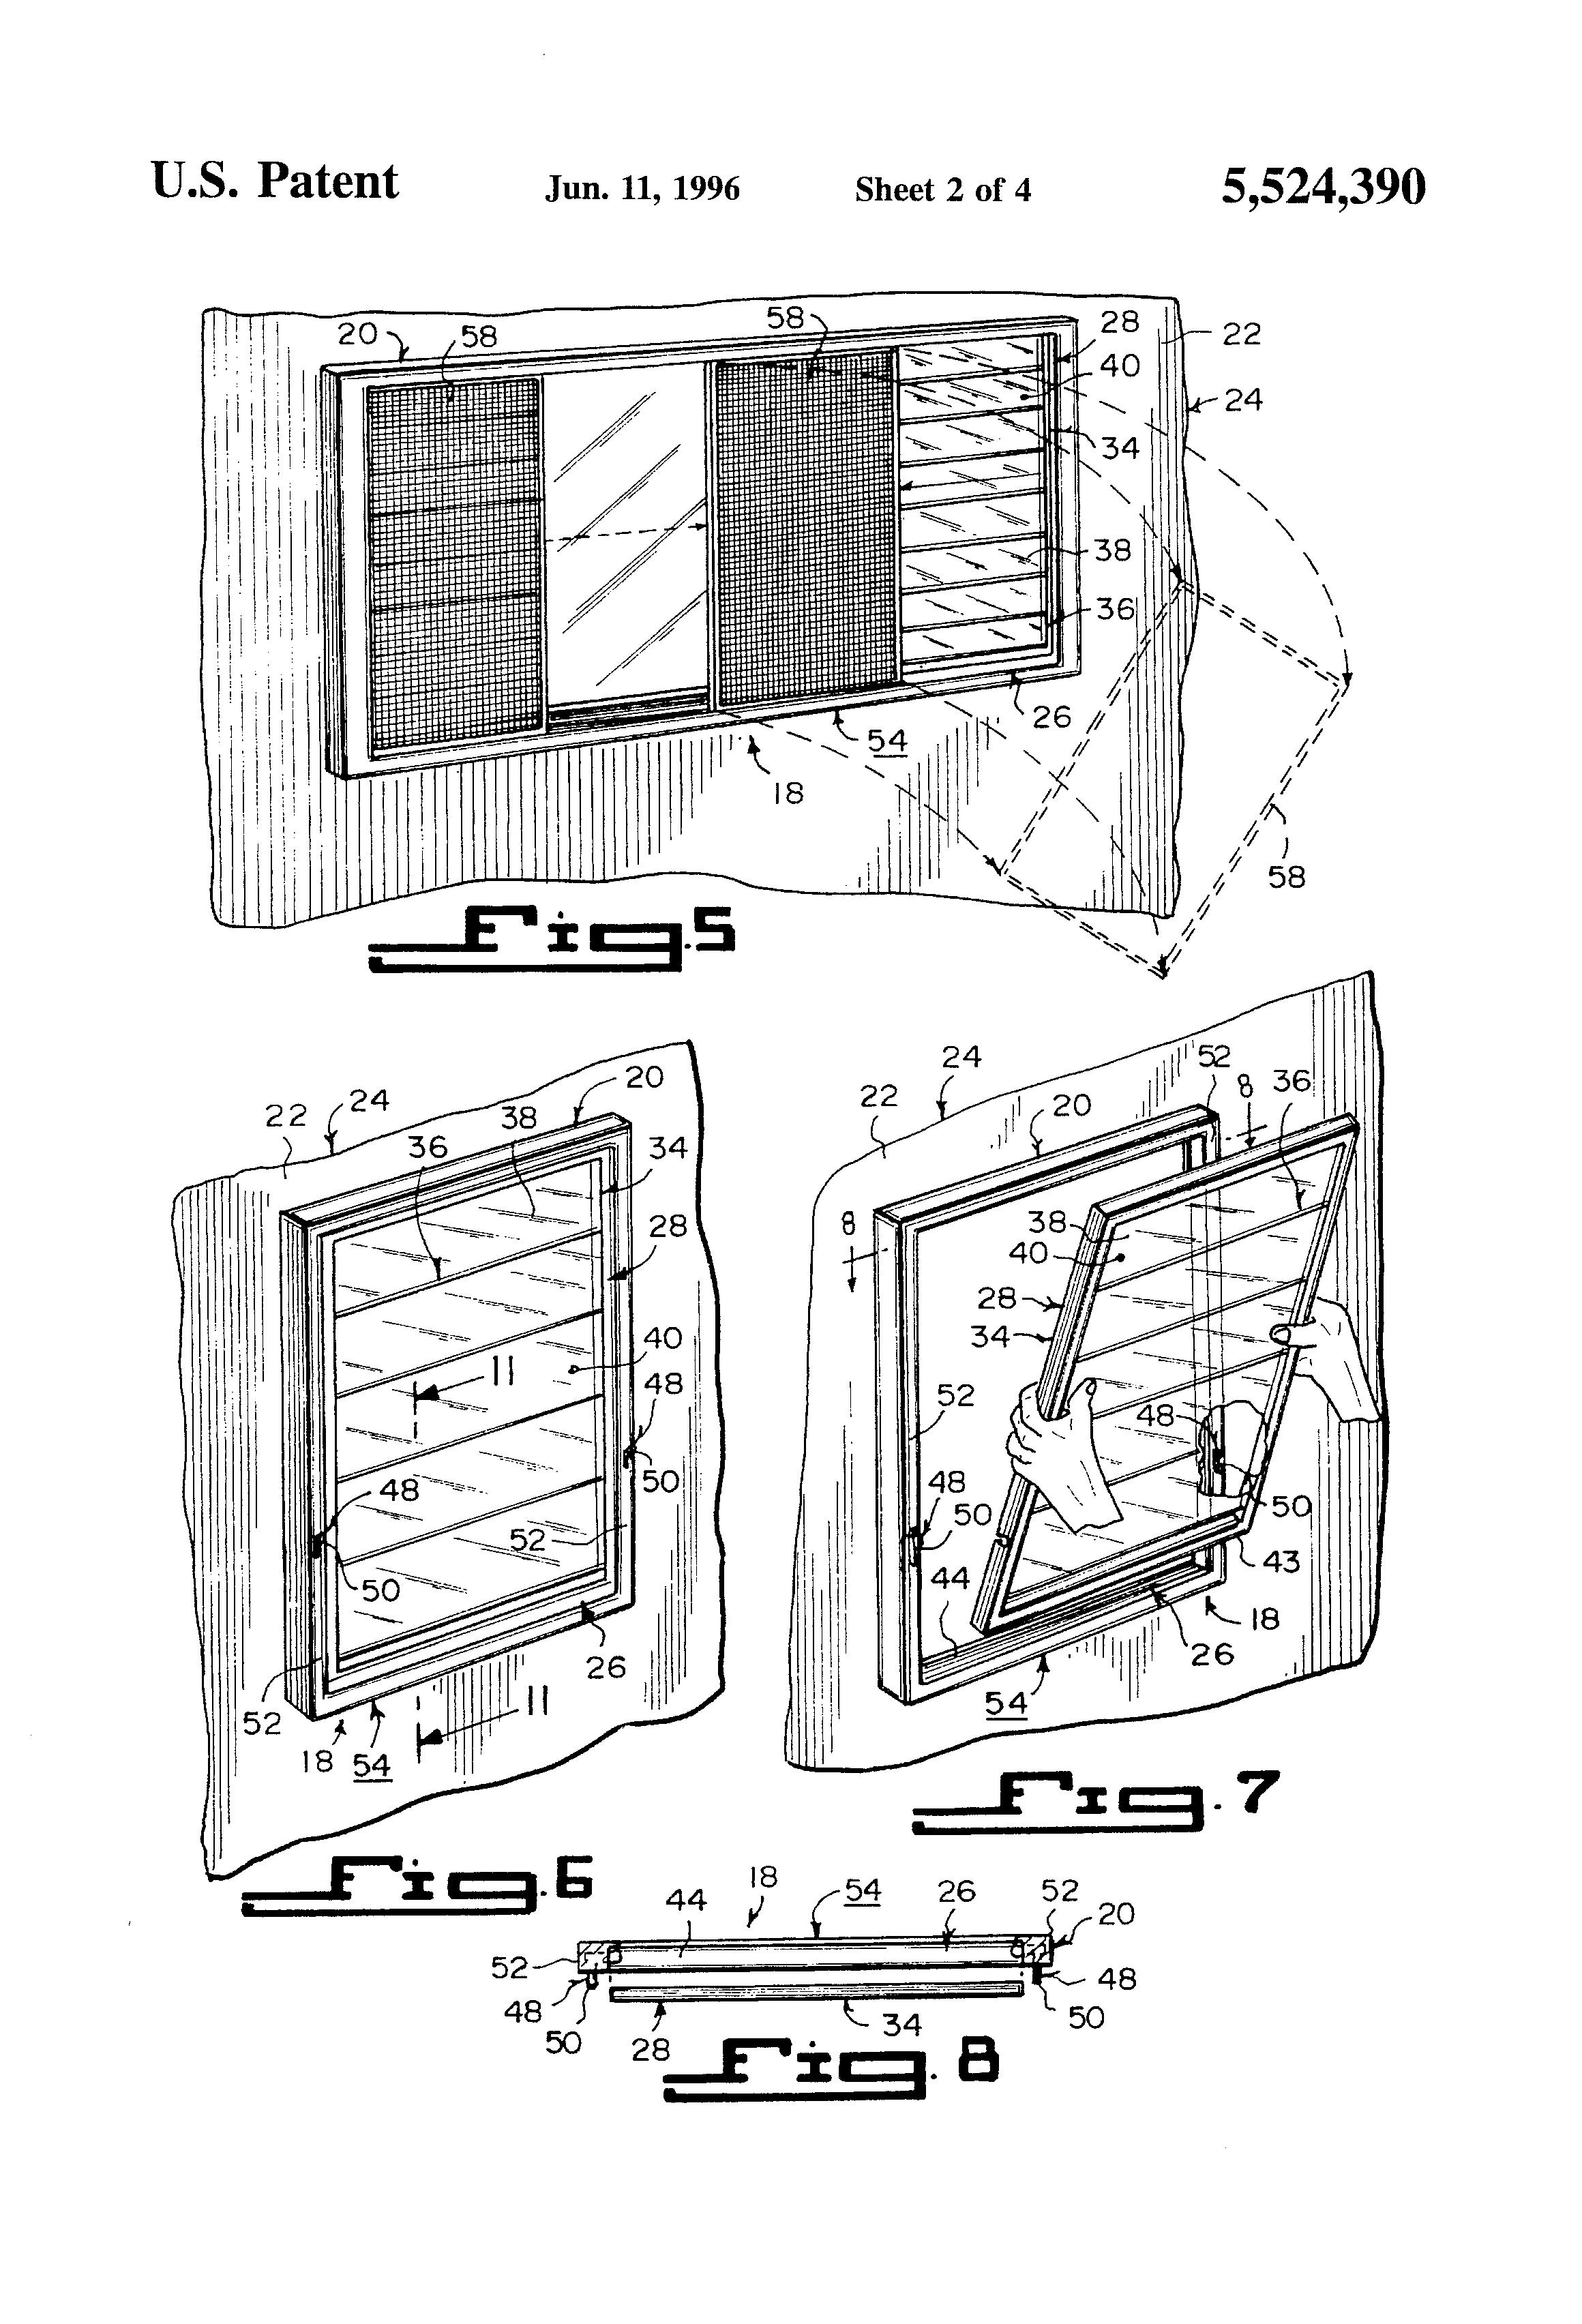 Vinyl Windows Milgard Vinyl Windows Replacement Parts